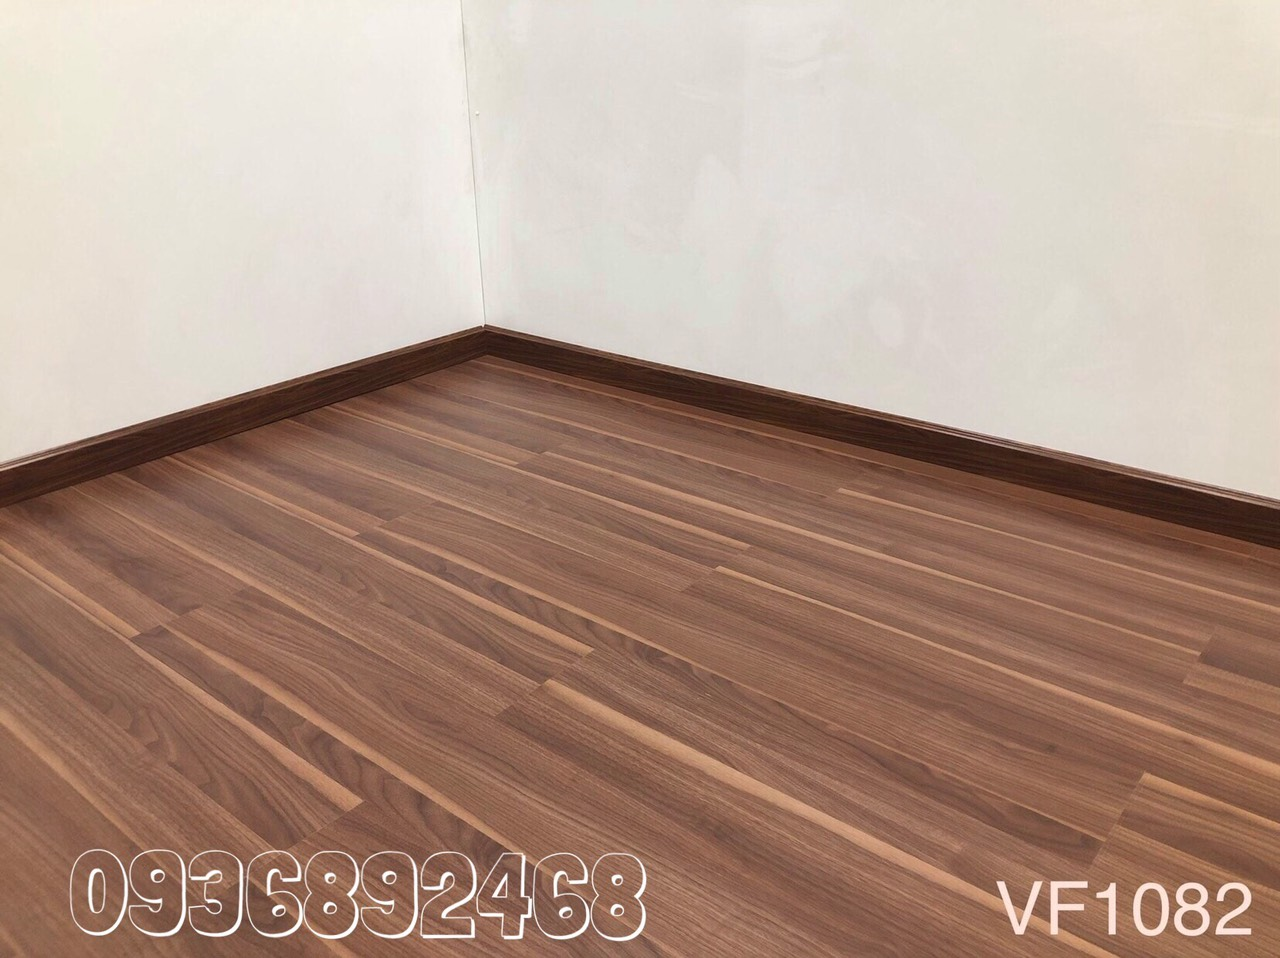 SÀN GỖ THAIXIN 8MM VF1082